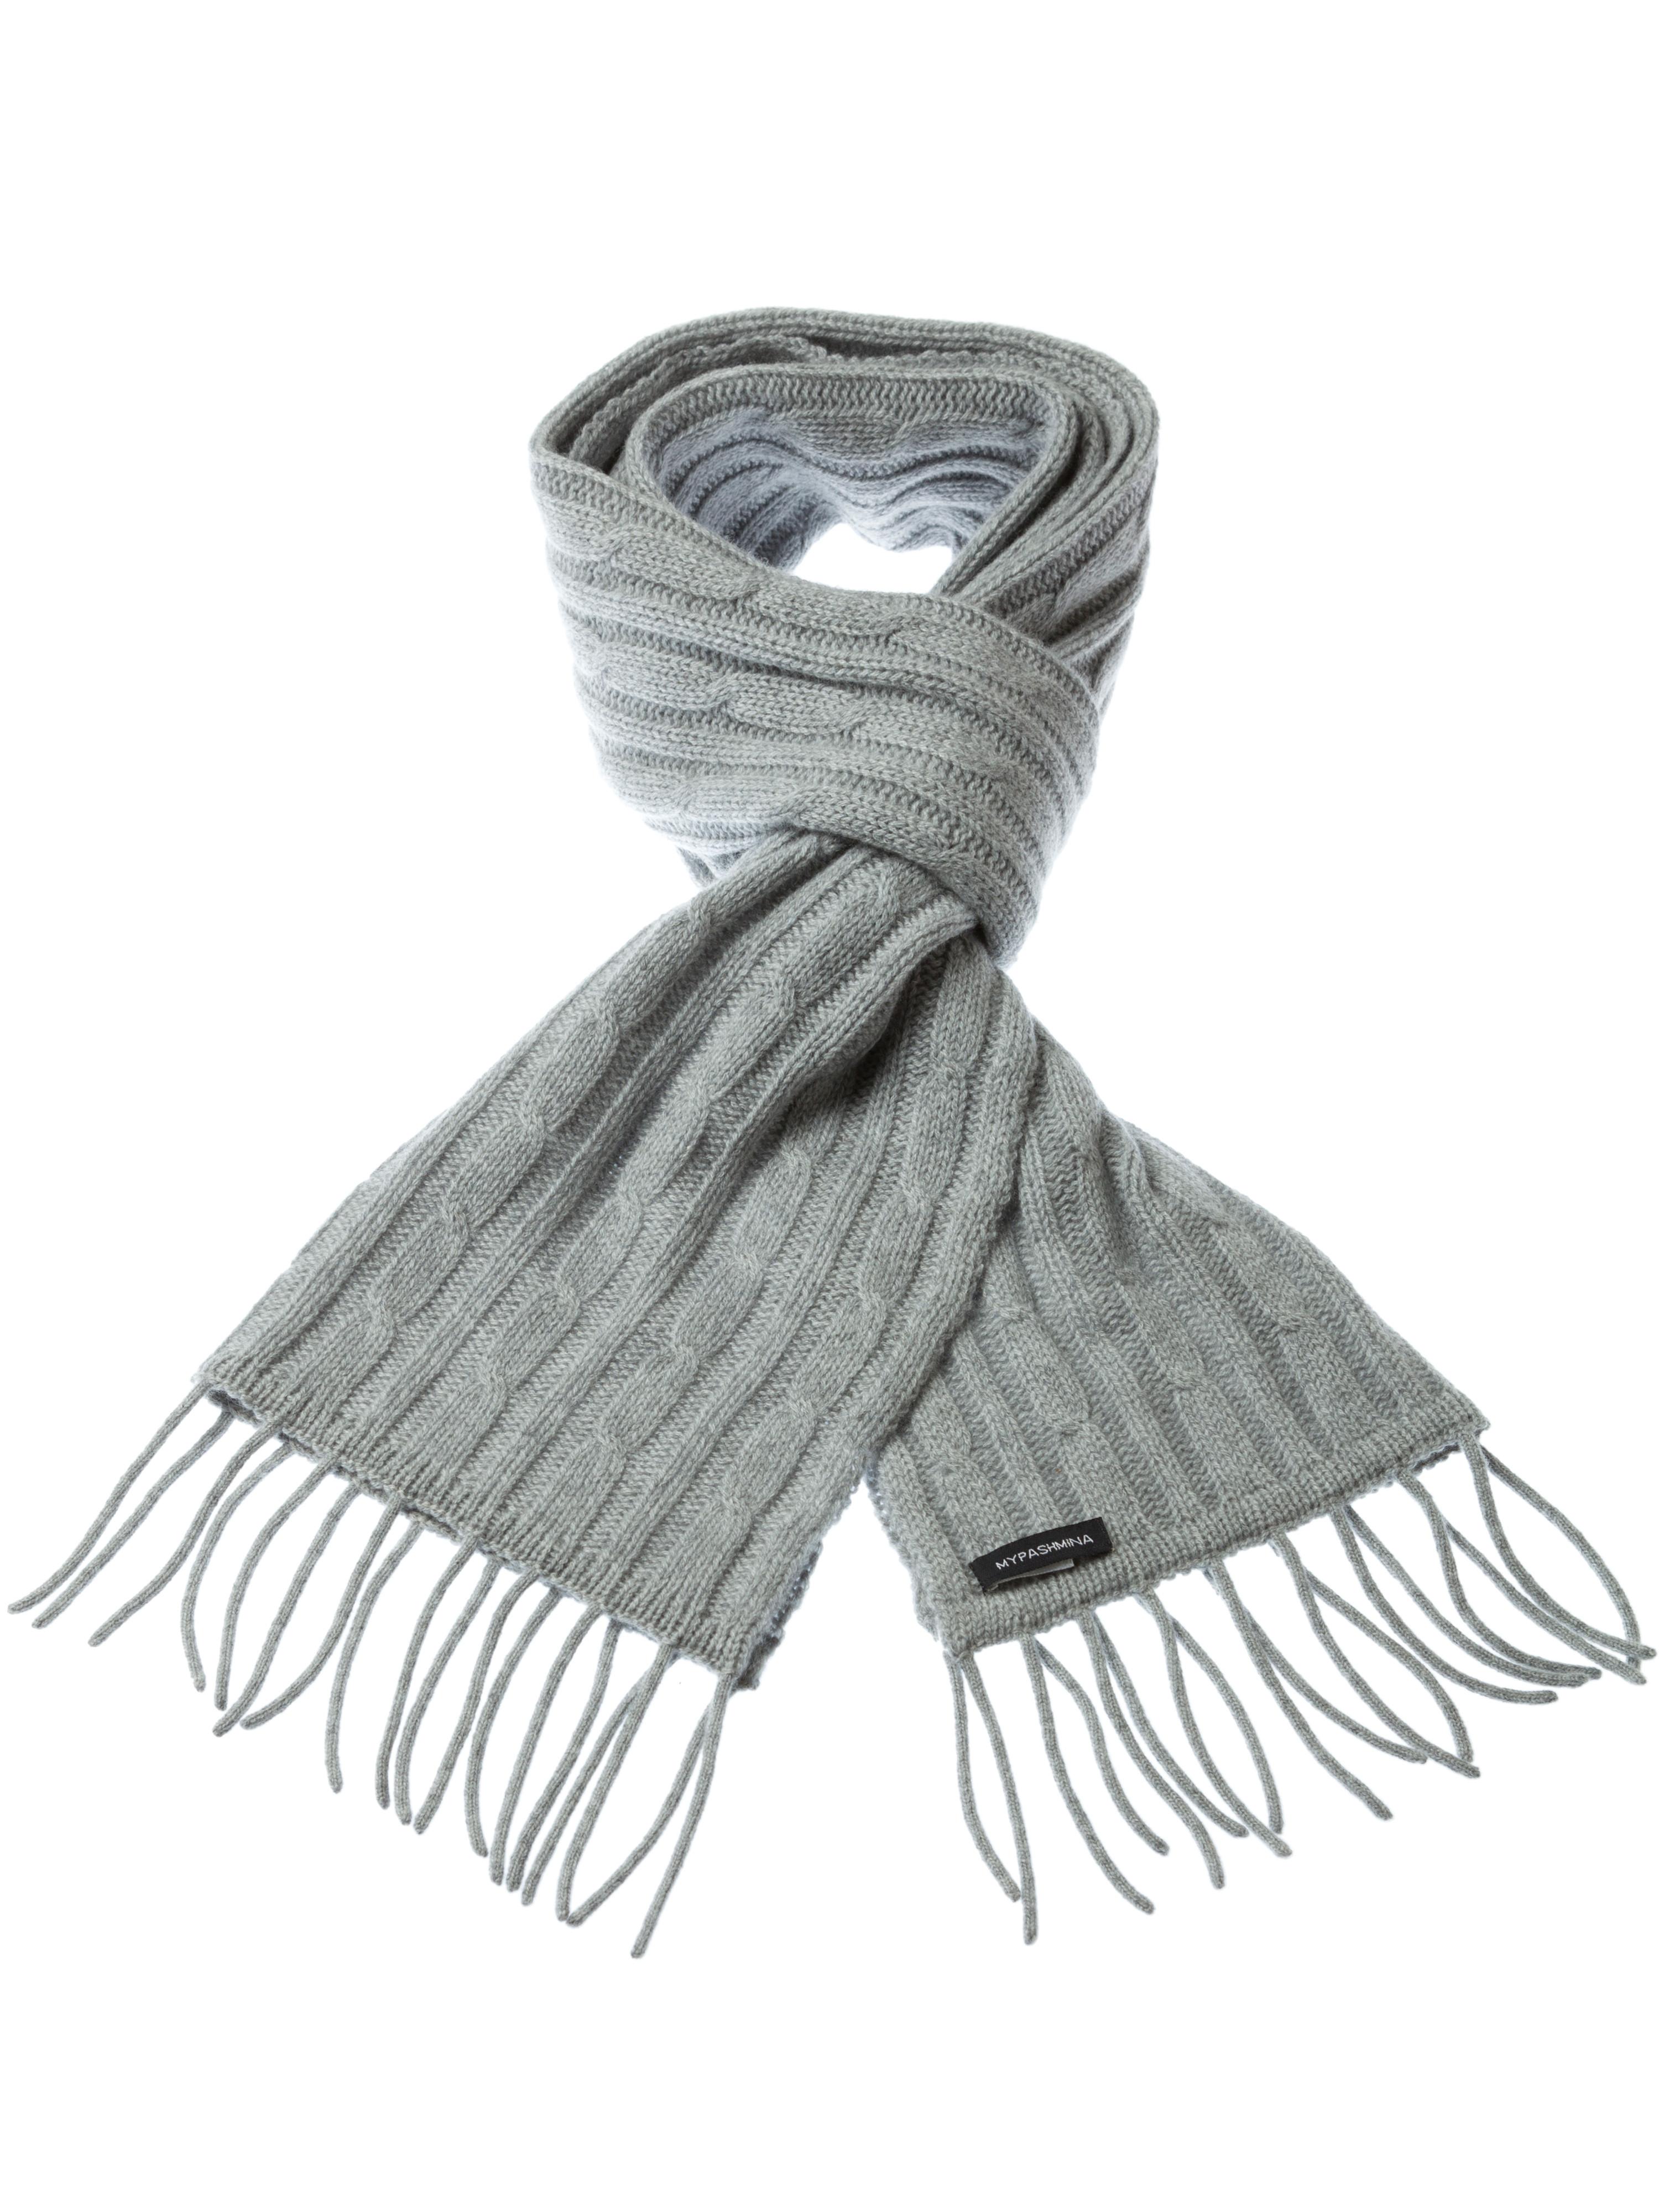 54e95fa13cc Buy Cable Knit Scarf - 100% Cashmere - 35x180cm - Melange Light Grey ...